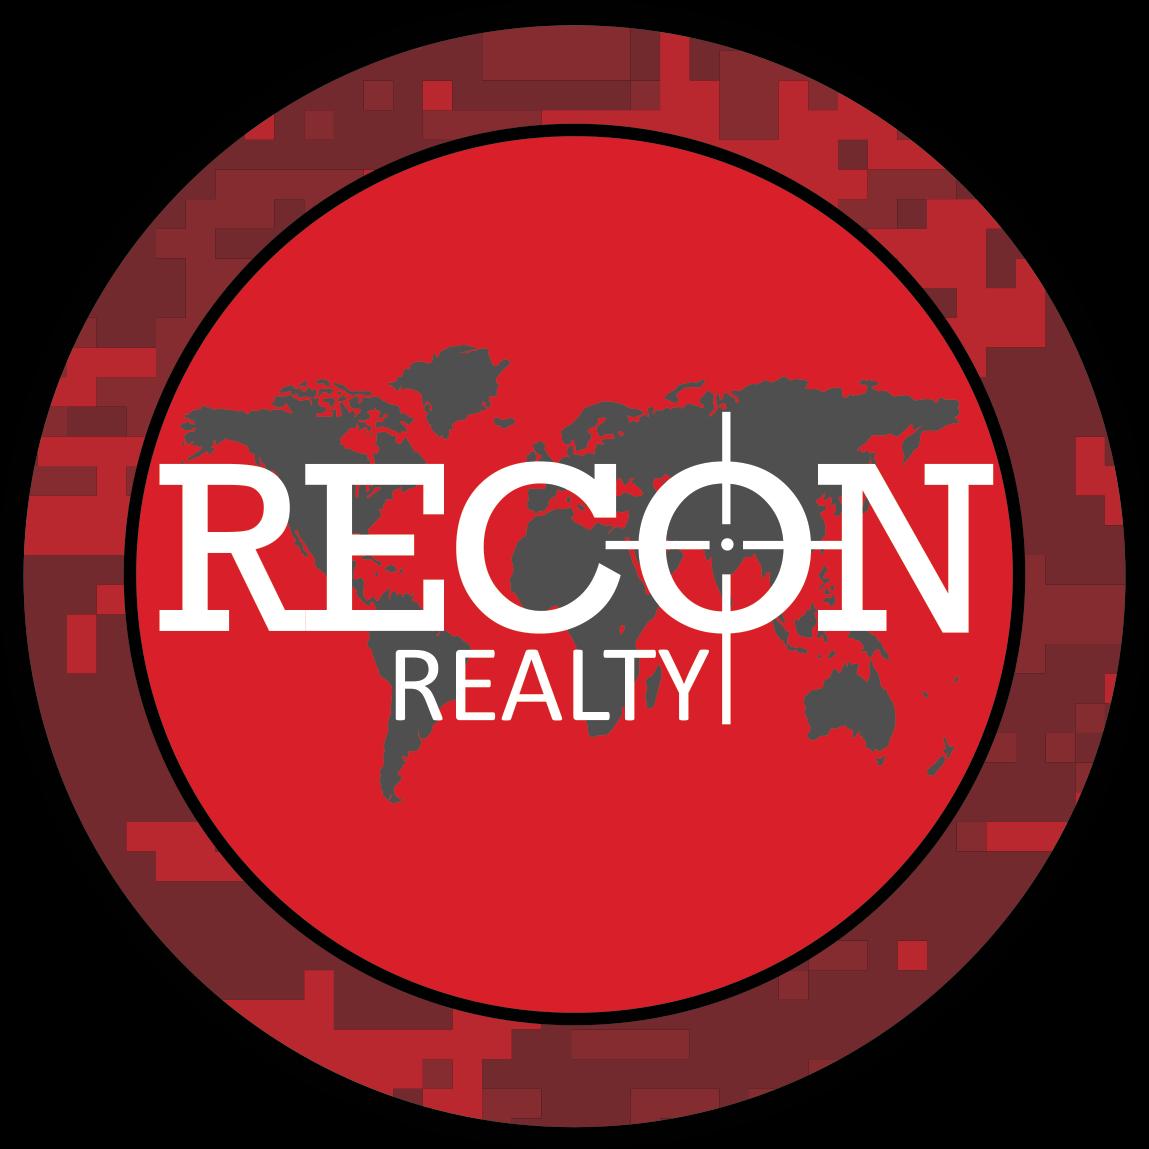 Recon Realty, PBC